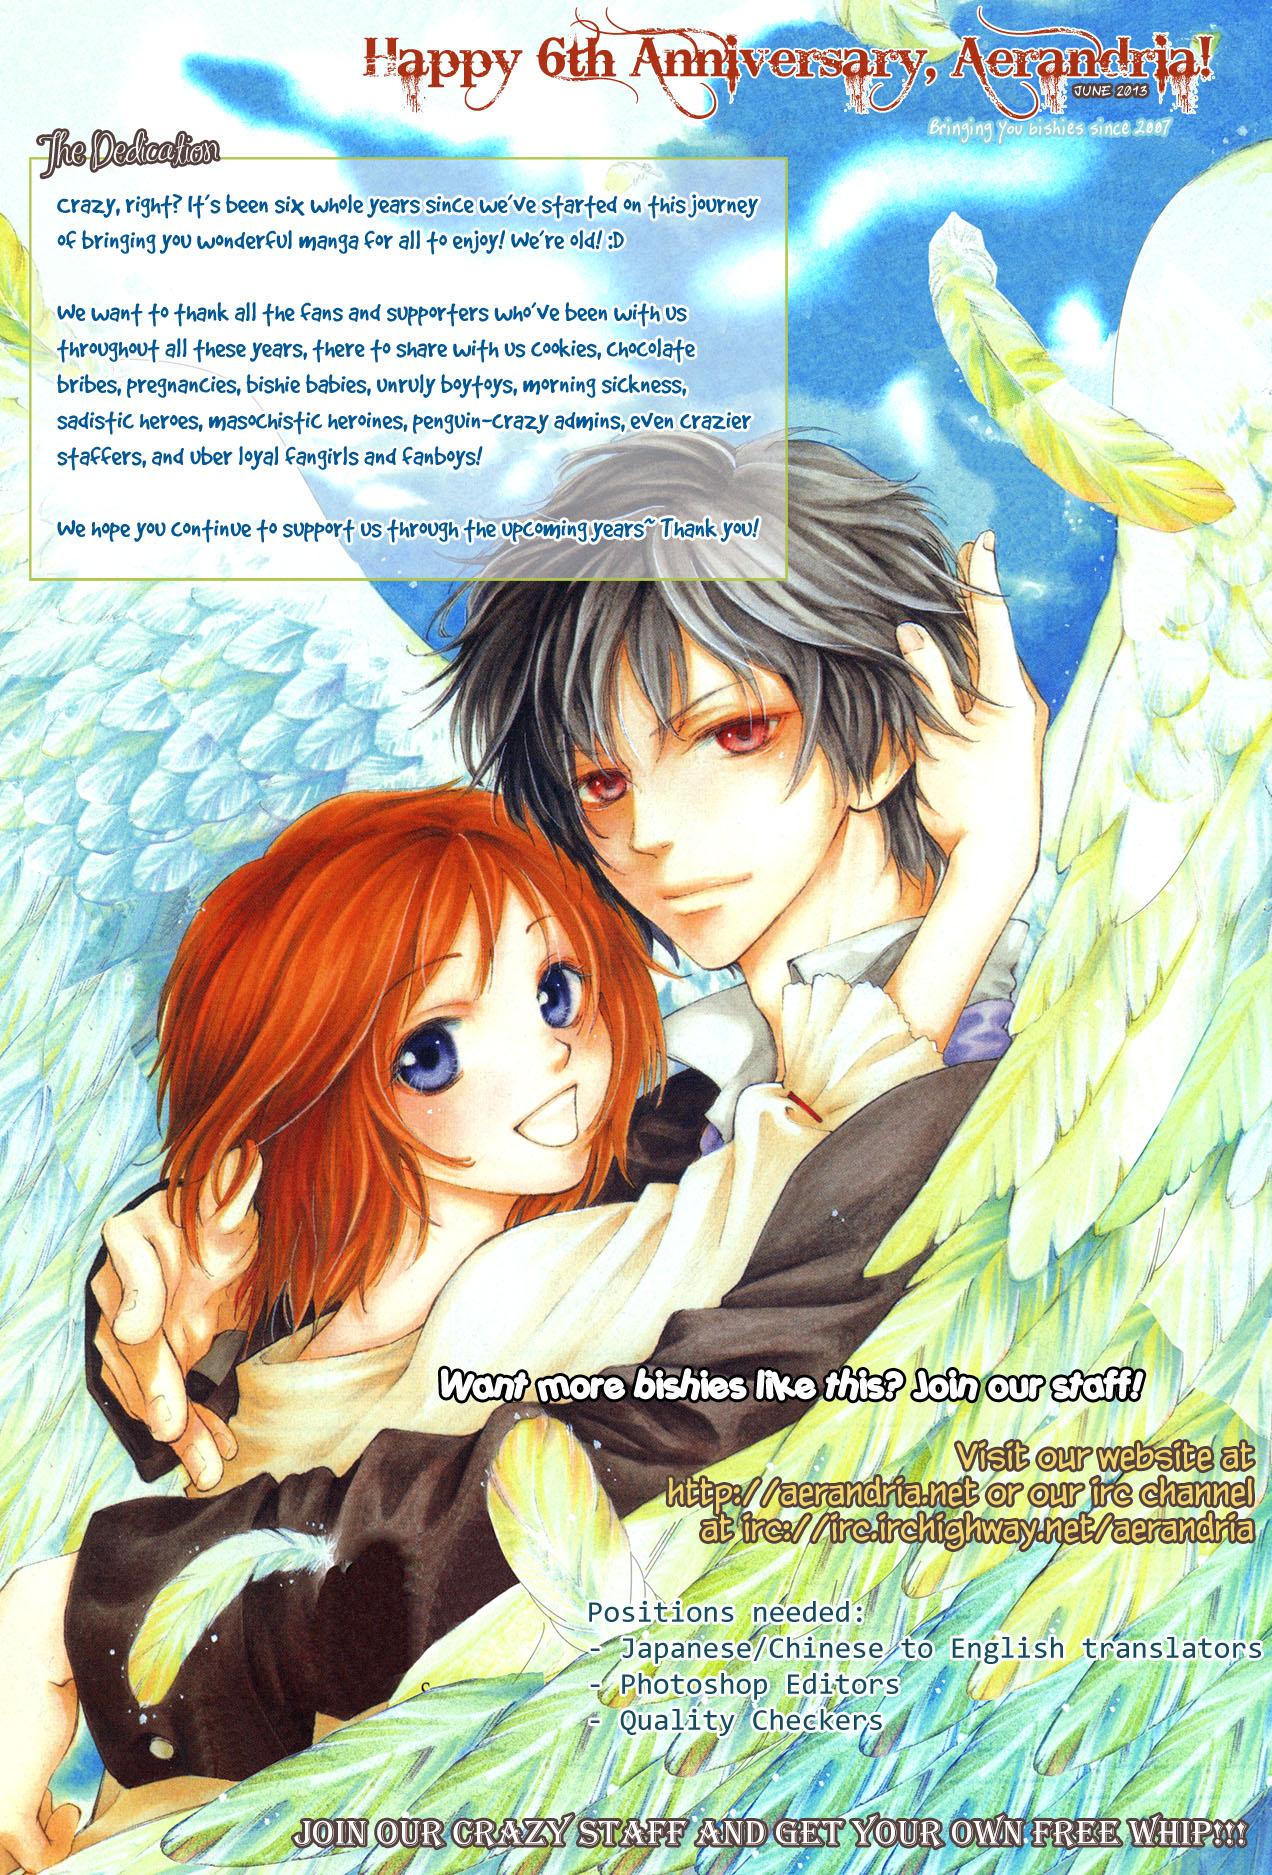 https://c5.ninemanga.com/es_manga/0/1920/395325/3346edef3d798511fa28891ffe0aa3cc.jpg Page 1